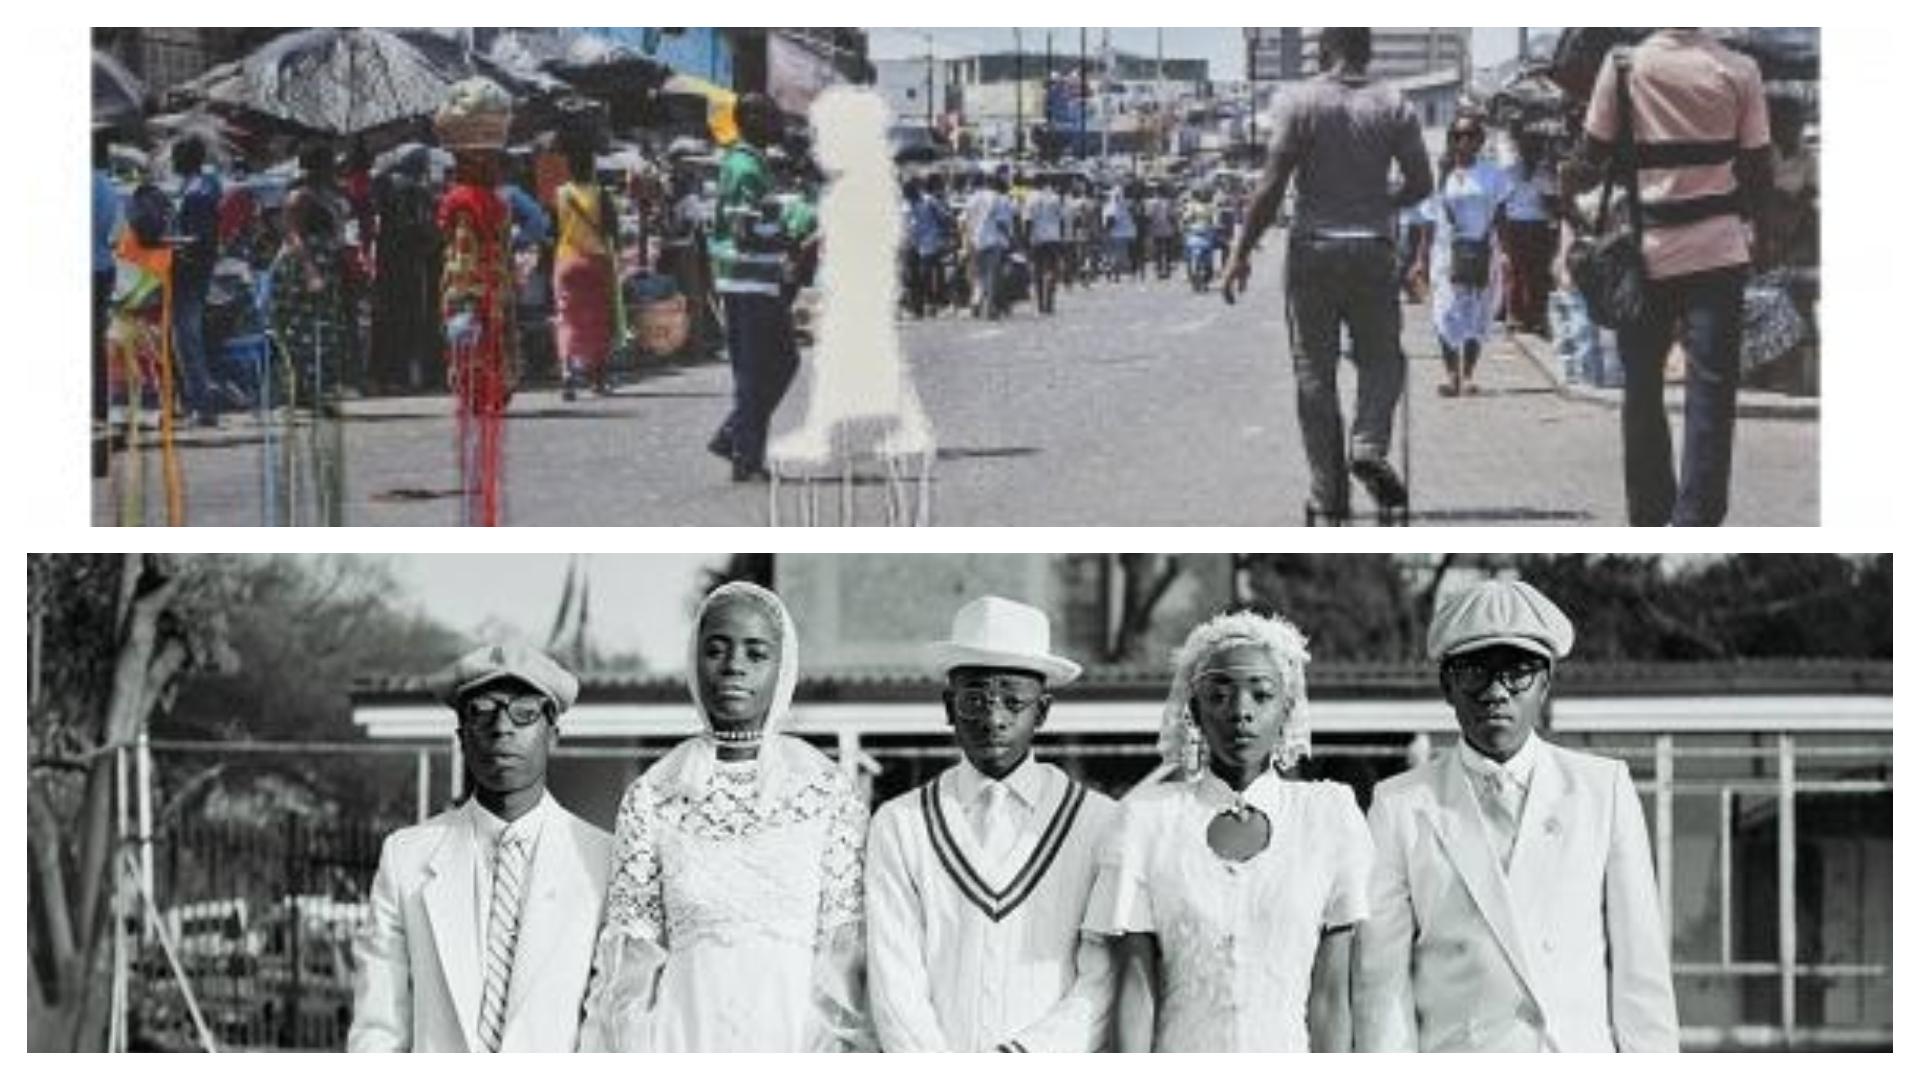 La cultura africana diventa protagonista di una mostra a Milano fino al 2 aprile